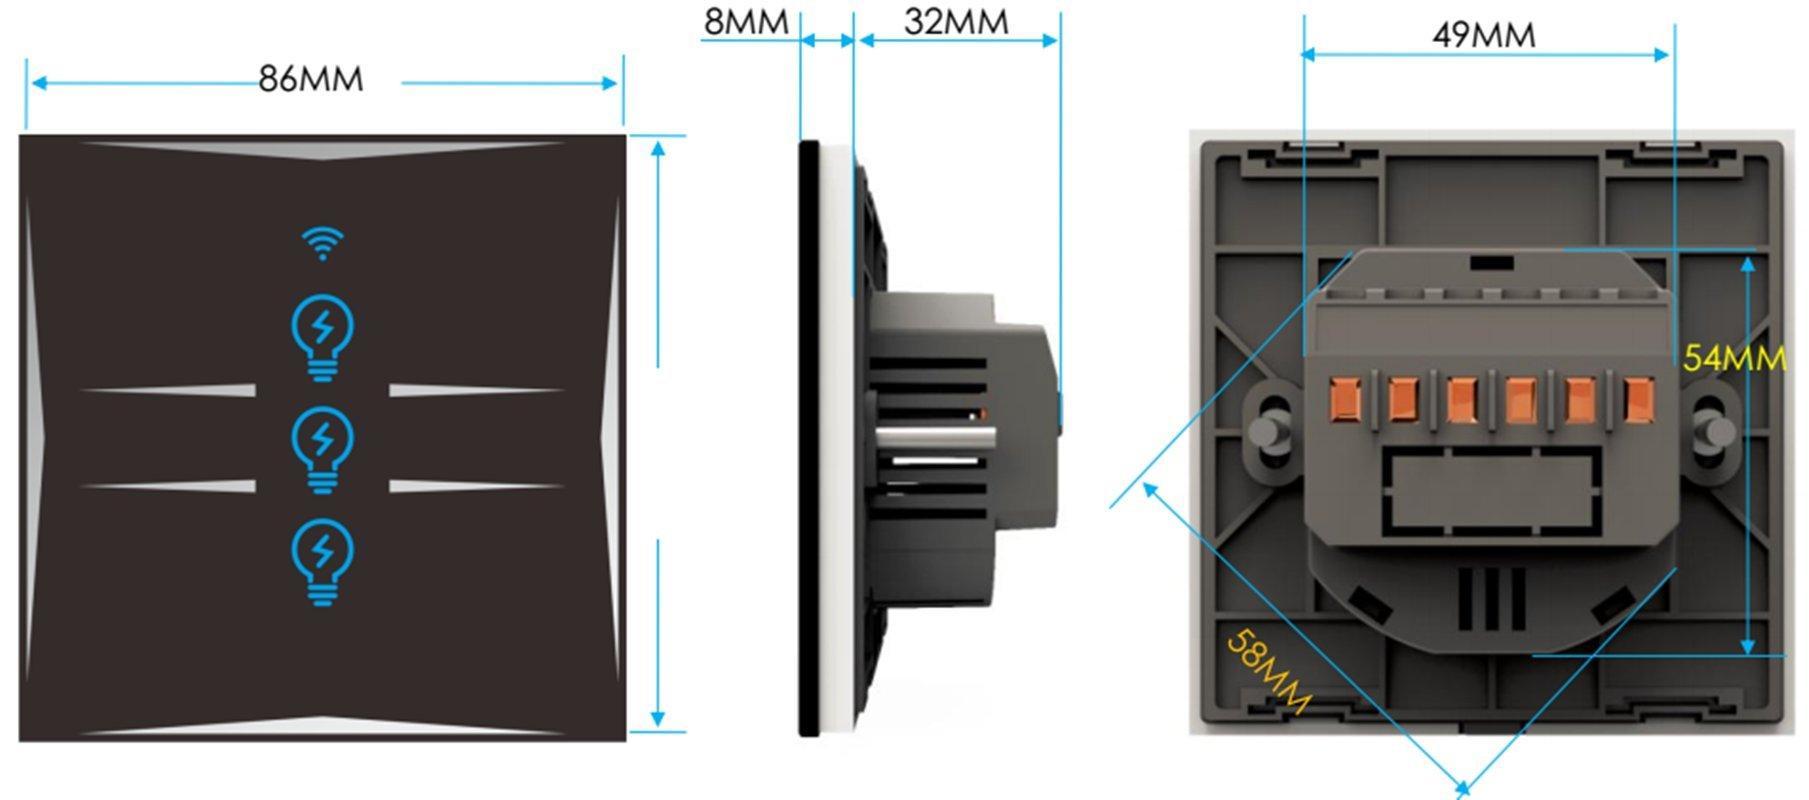 Smart Home Wall Light Switch 2 Gang WIFI Touch Sensitive Glass ...